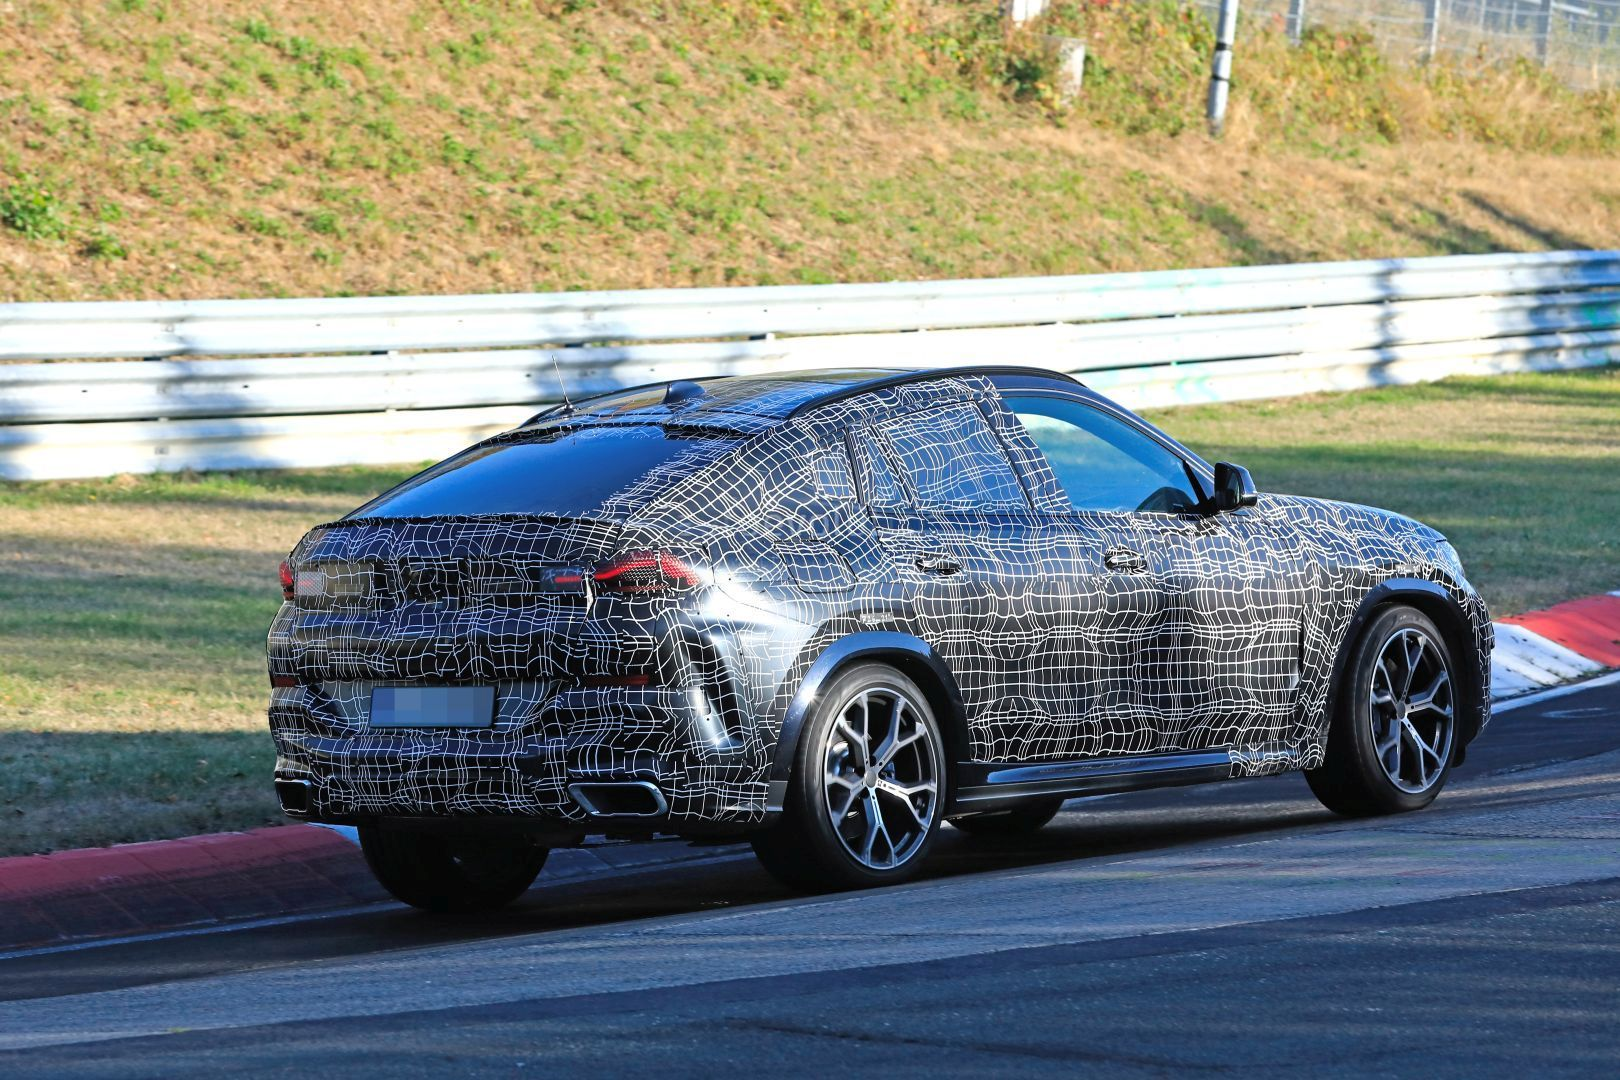 2020-bmw-x6-laps-nurburgring-prototype-reveals-sharper-look_7